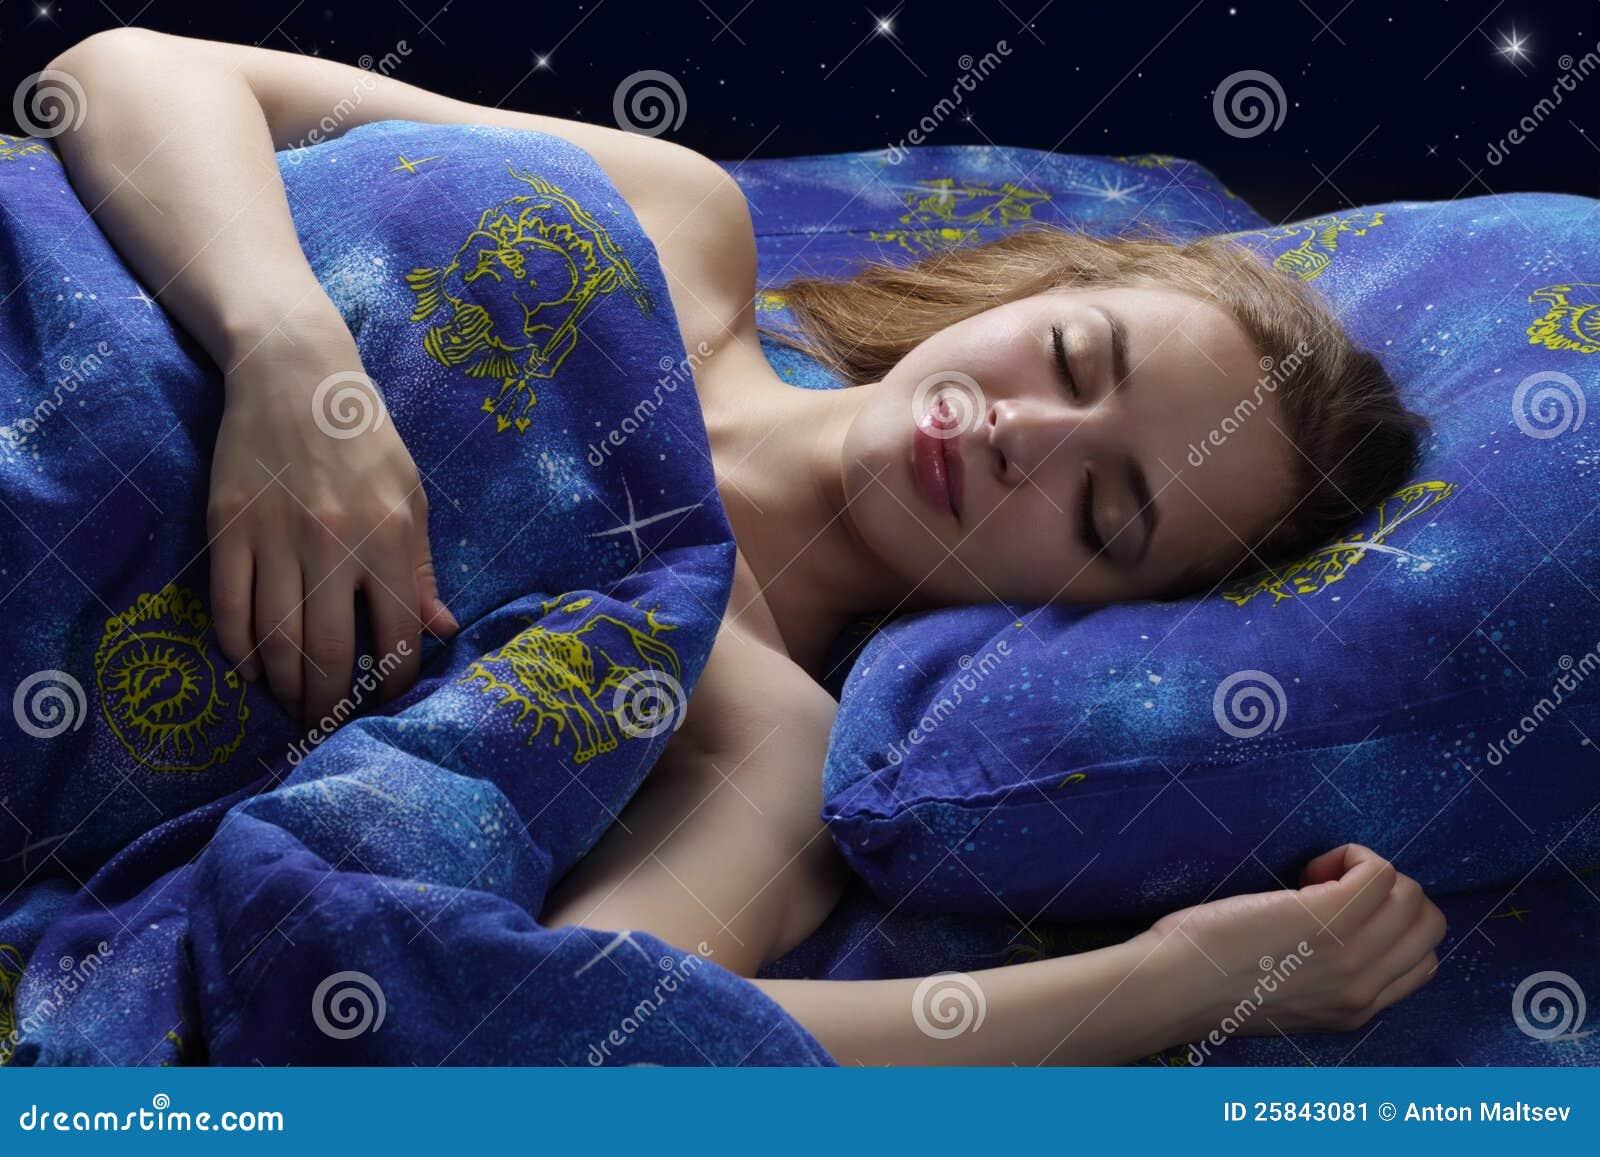 teen girls sleeping sex